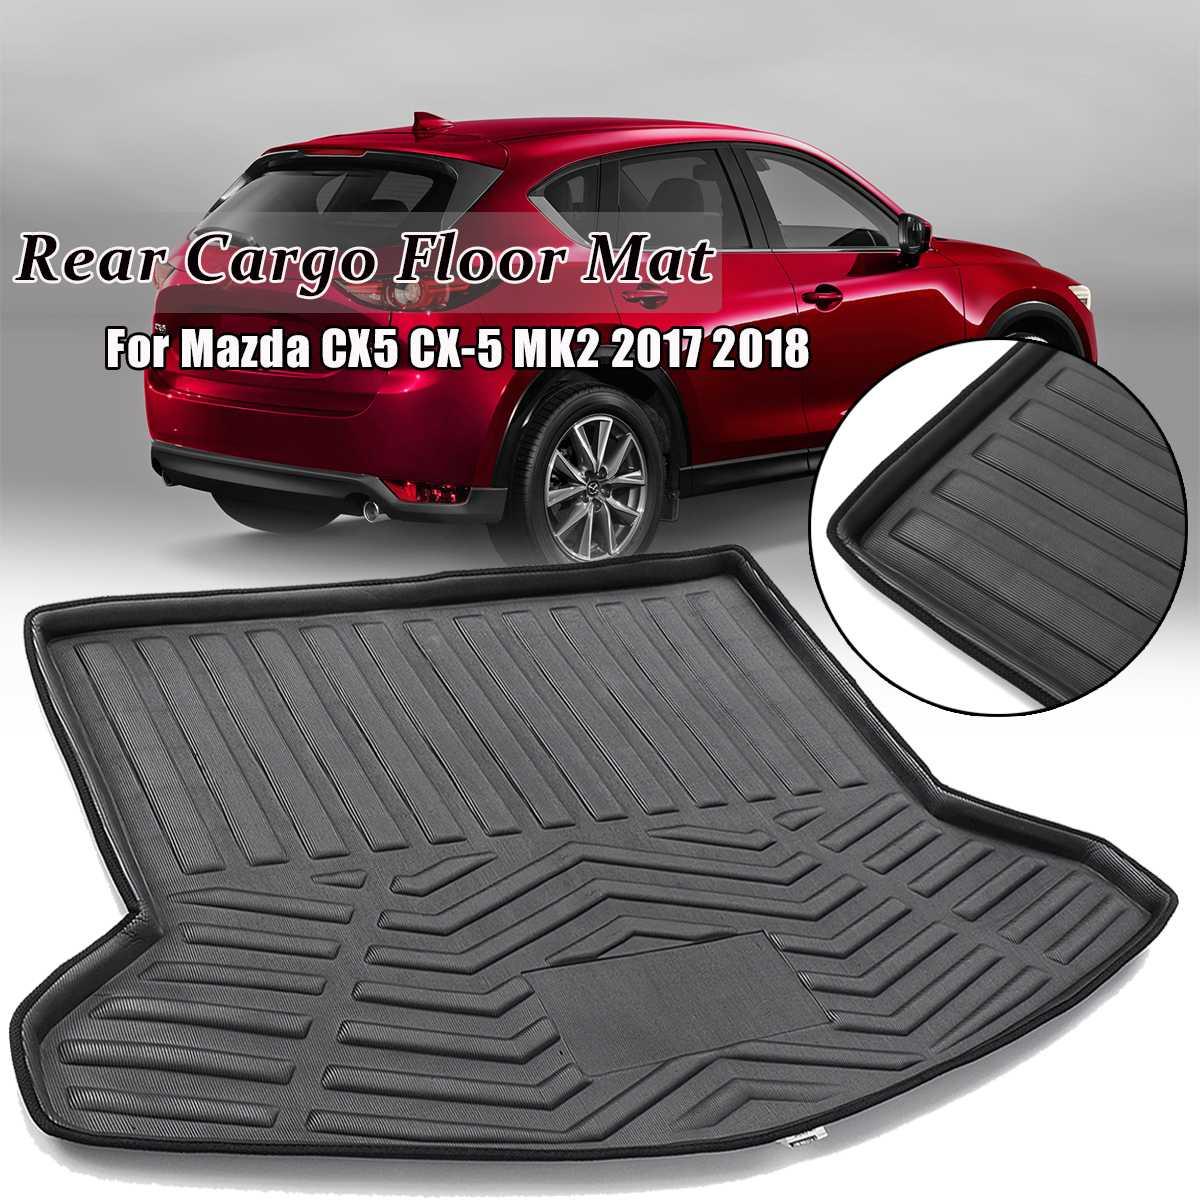 1pcs Car Rear Boot Liner Trunk Cargo Mat Tray For Mazda CX-5 CX5 MK2 2017 2018 Floor Carpet Mud Pad Protector1pcs Car Rear Boot Liner Trunk Cargo Mat Tray For Mazda CX-5 CX5 MK2 2017 2018 Floor Carpet Mud Pad Protector